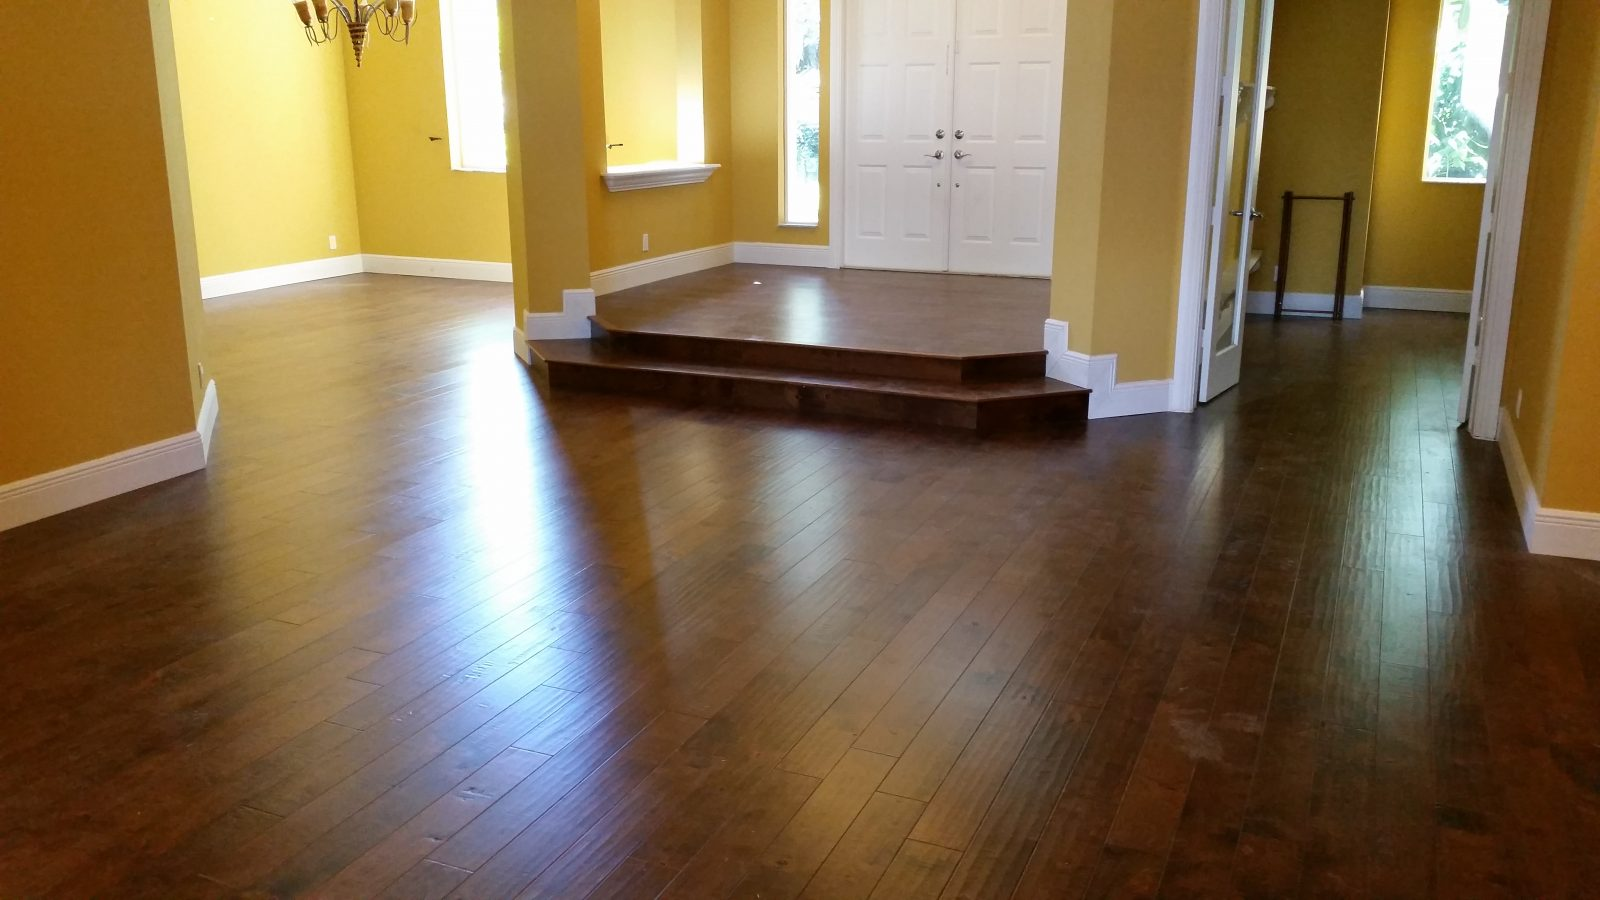 size floors removing hardwood flooring wood floor full cleaning of engineered parquet stain floored